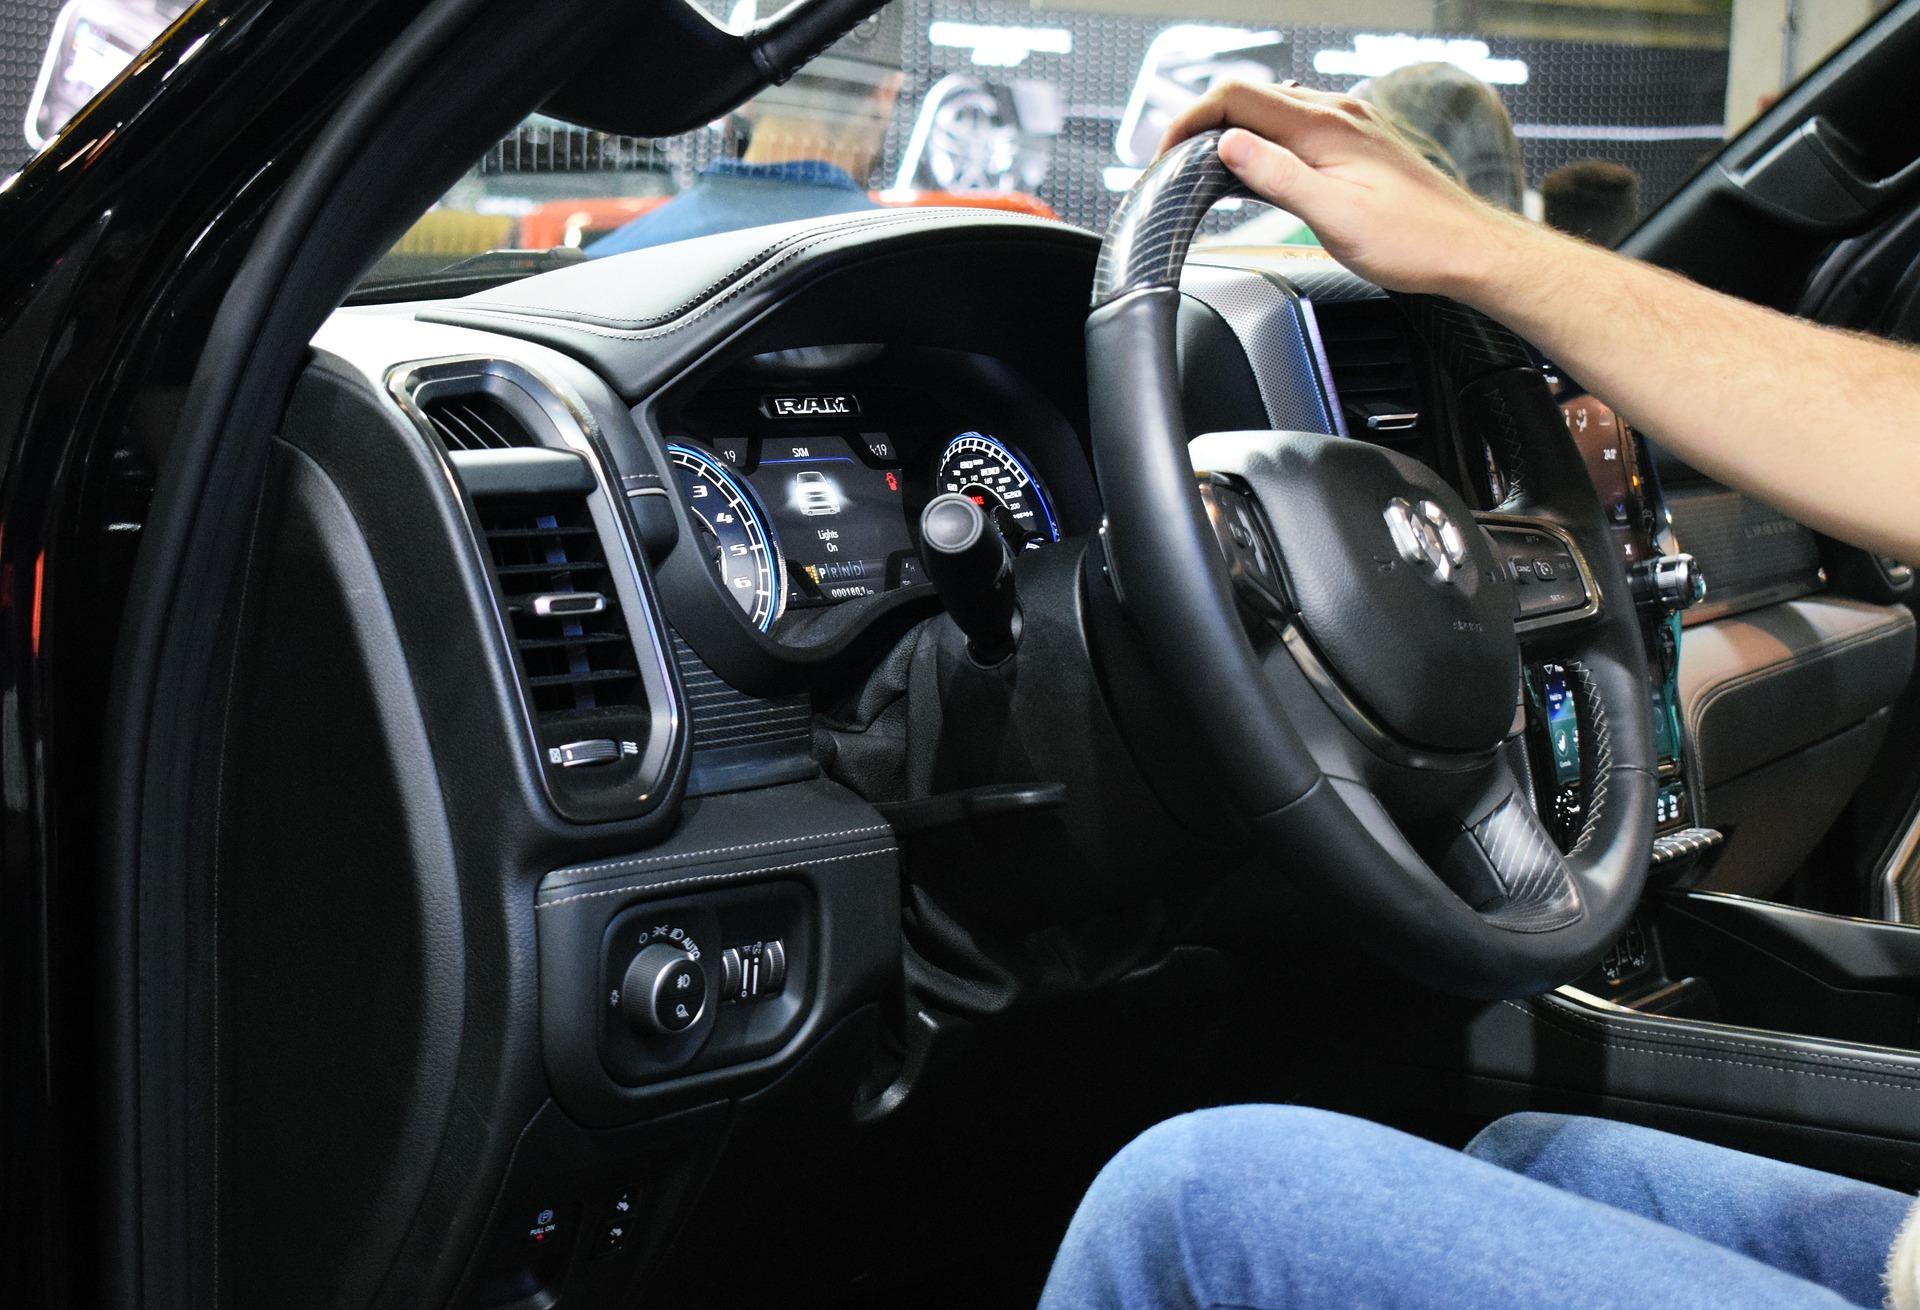 Best Aftermarket Performance Mods for Dodge Ram 1500 - The